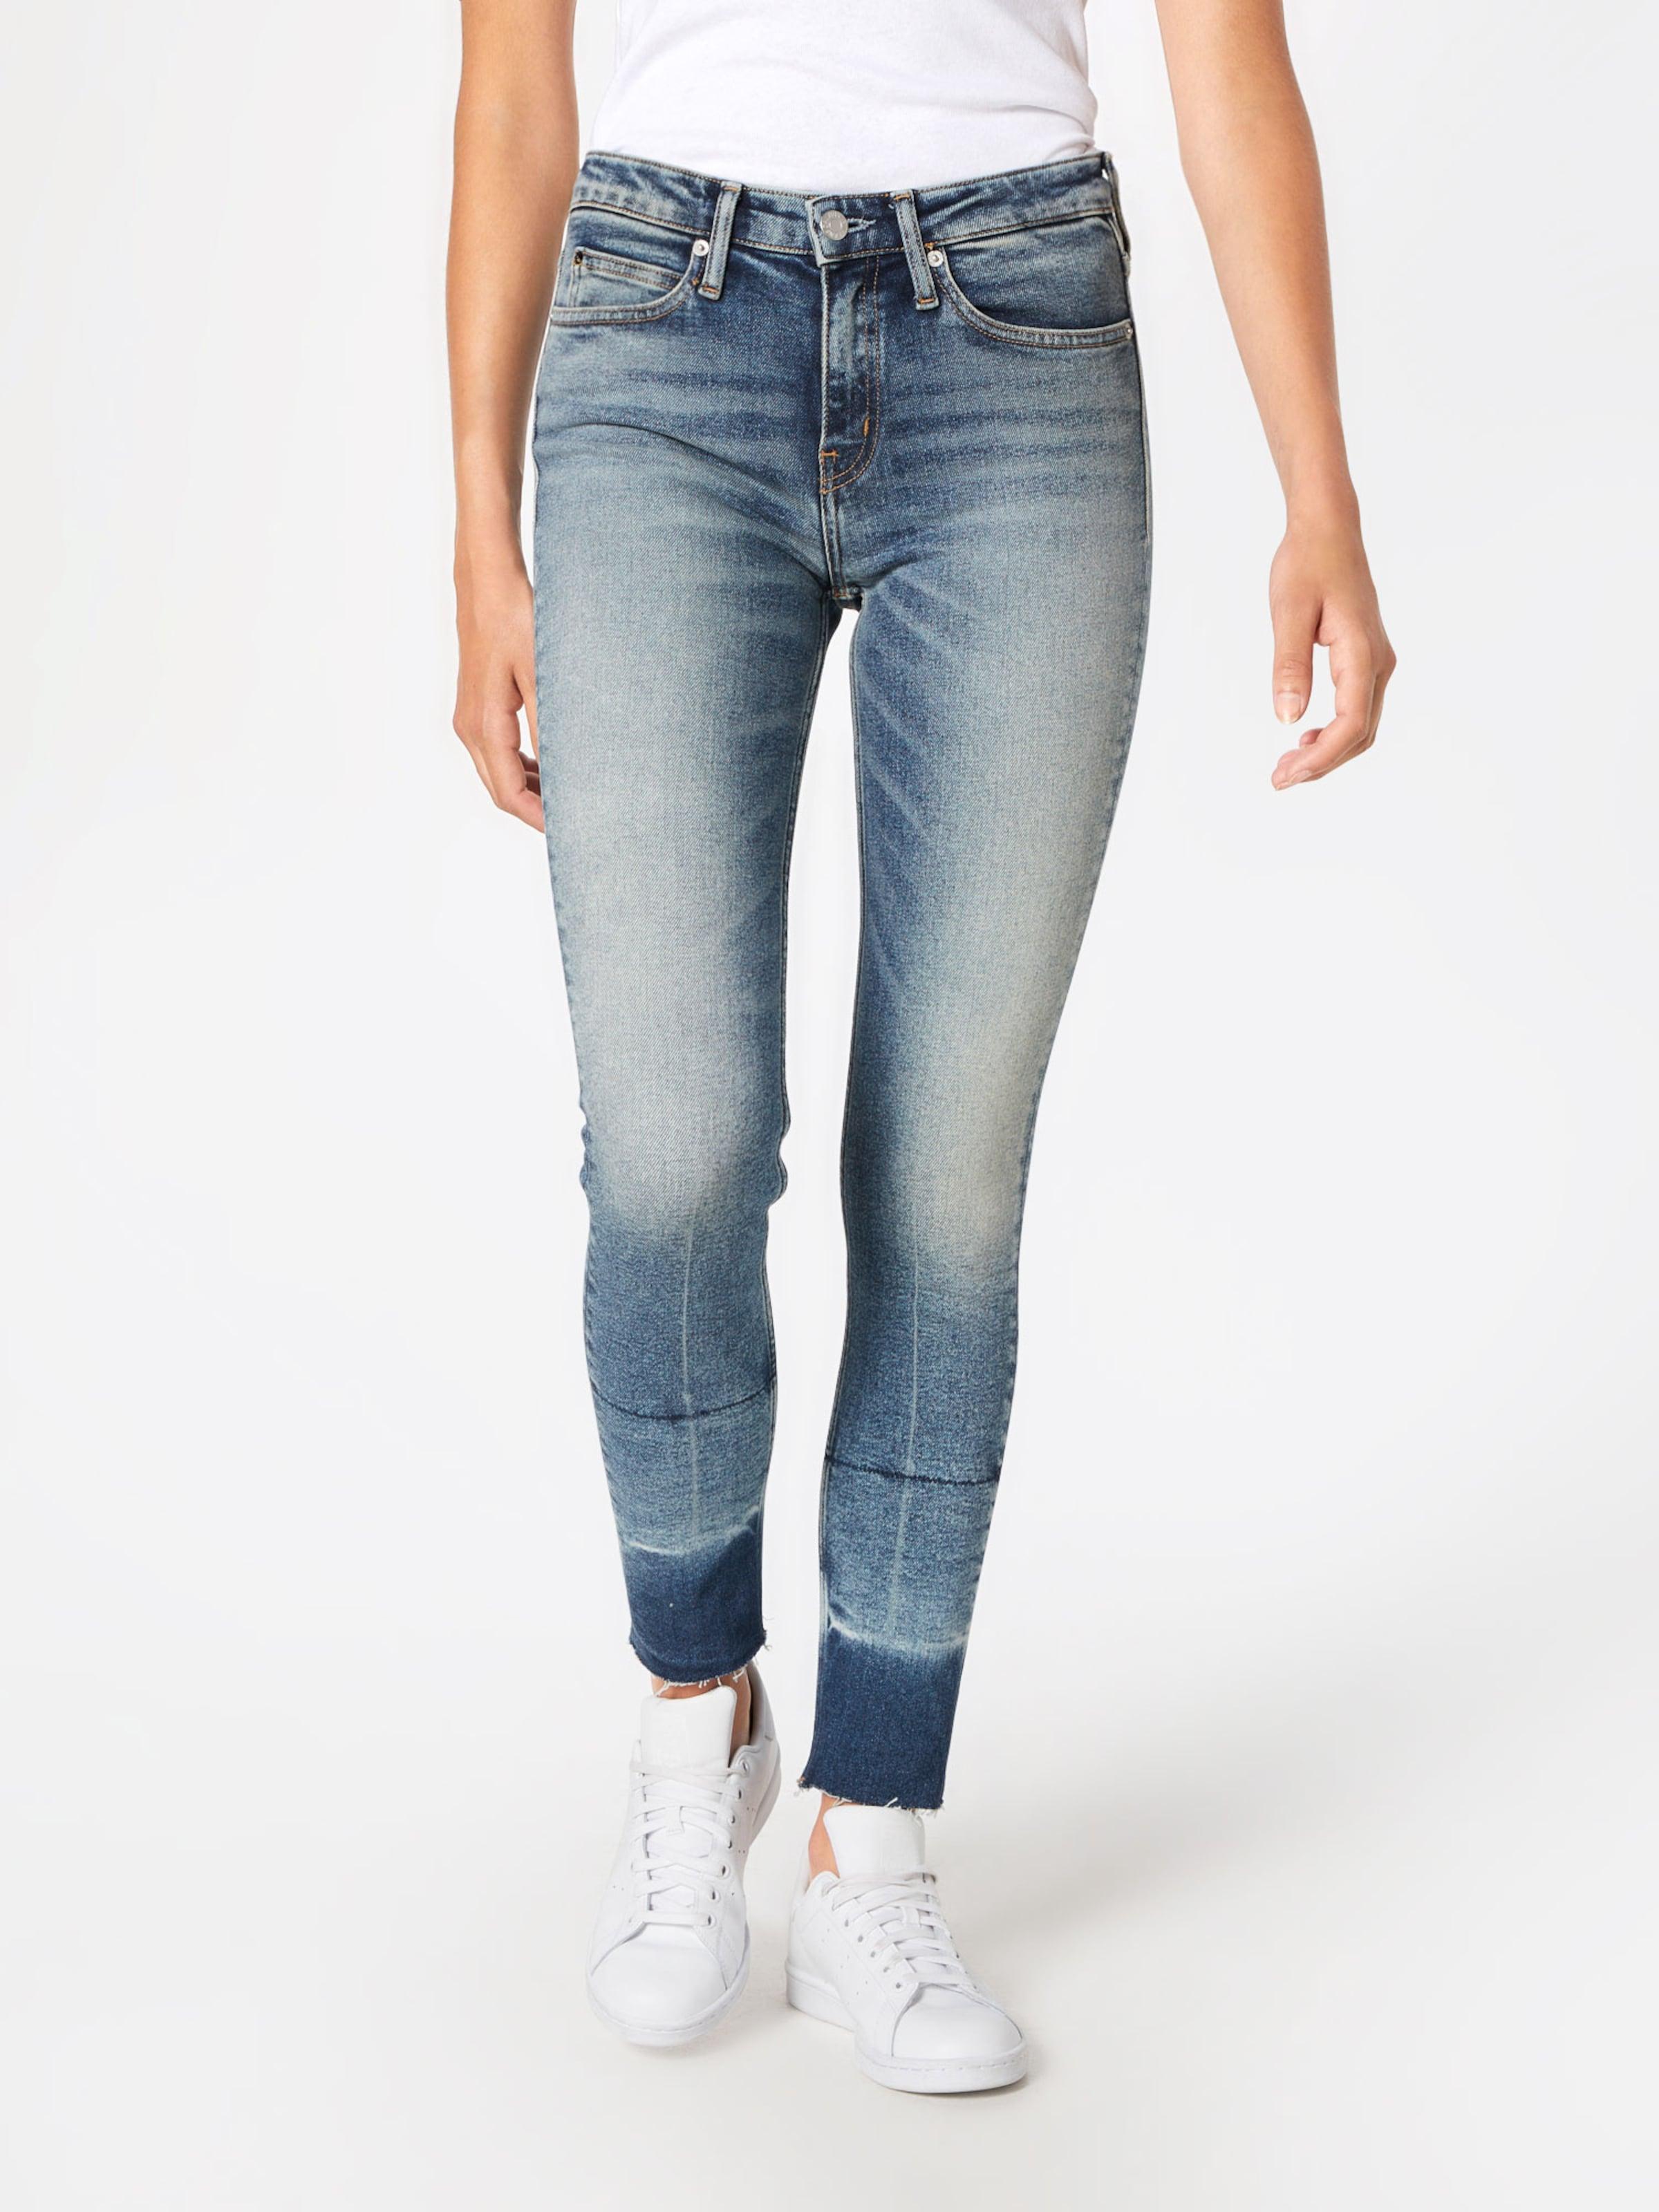 011 Calvin 'ckj Jeans Mid West Denim In Klein Blue Rise Skinny Ankle' HI29ED